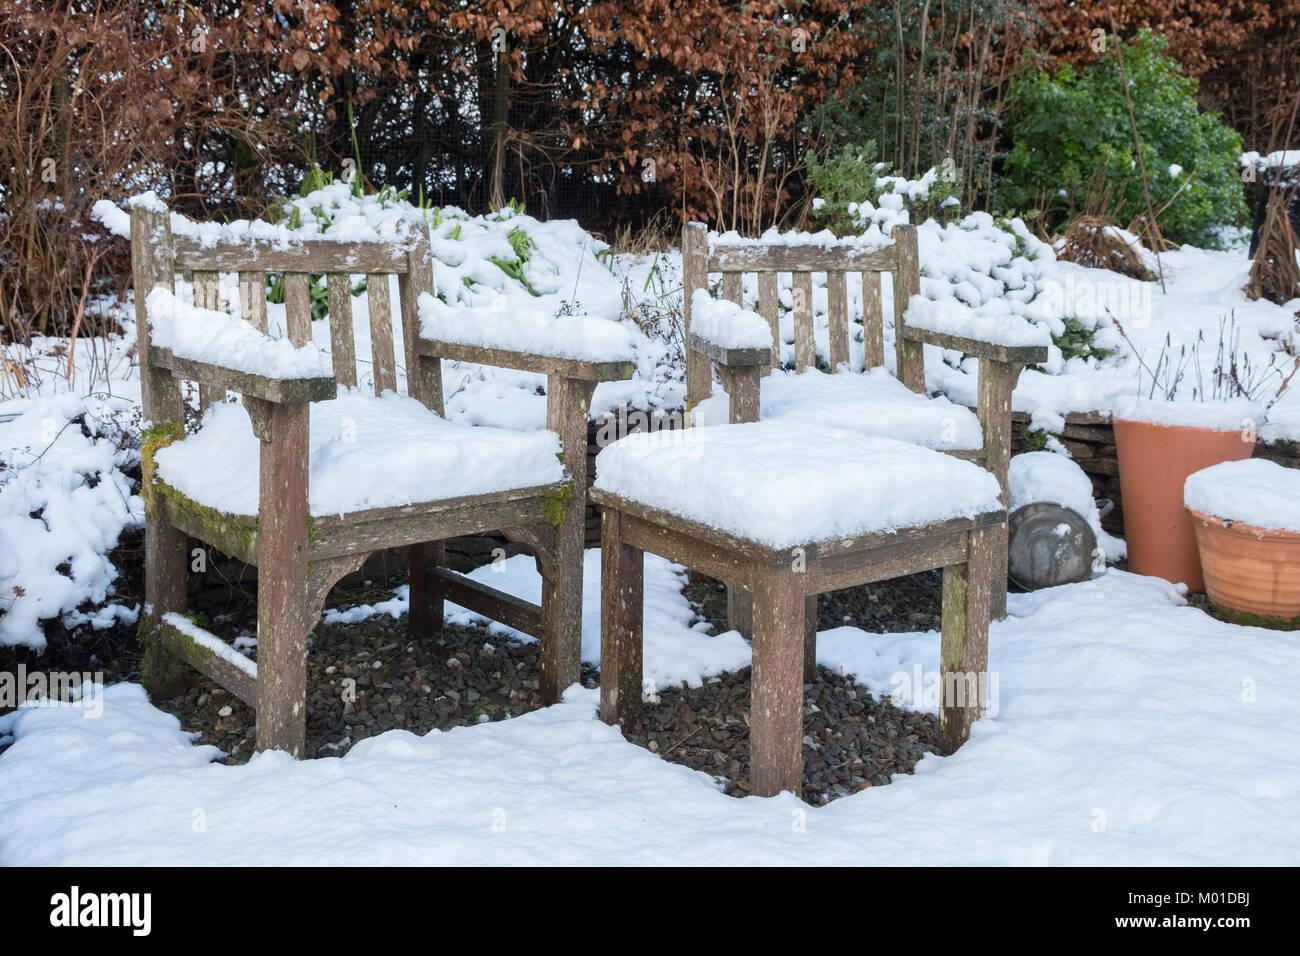 Holz Garten Möbel im Schnee Stockbild